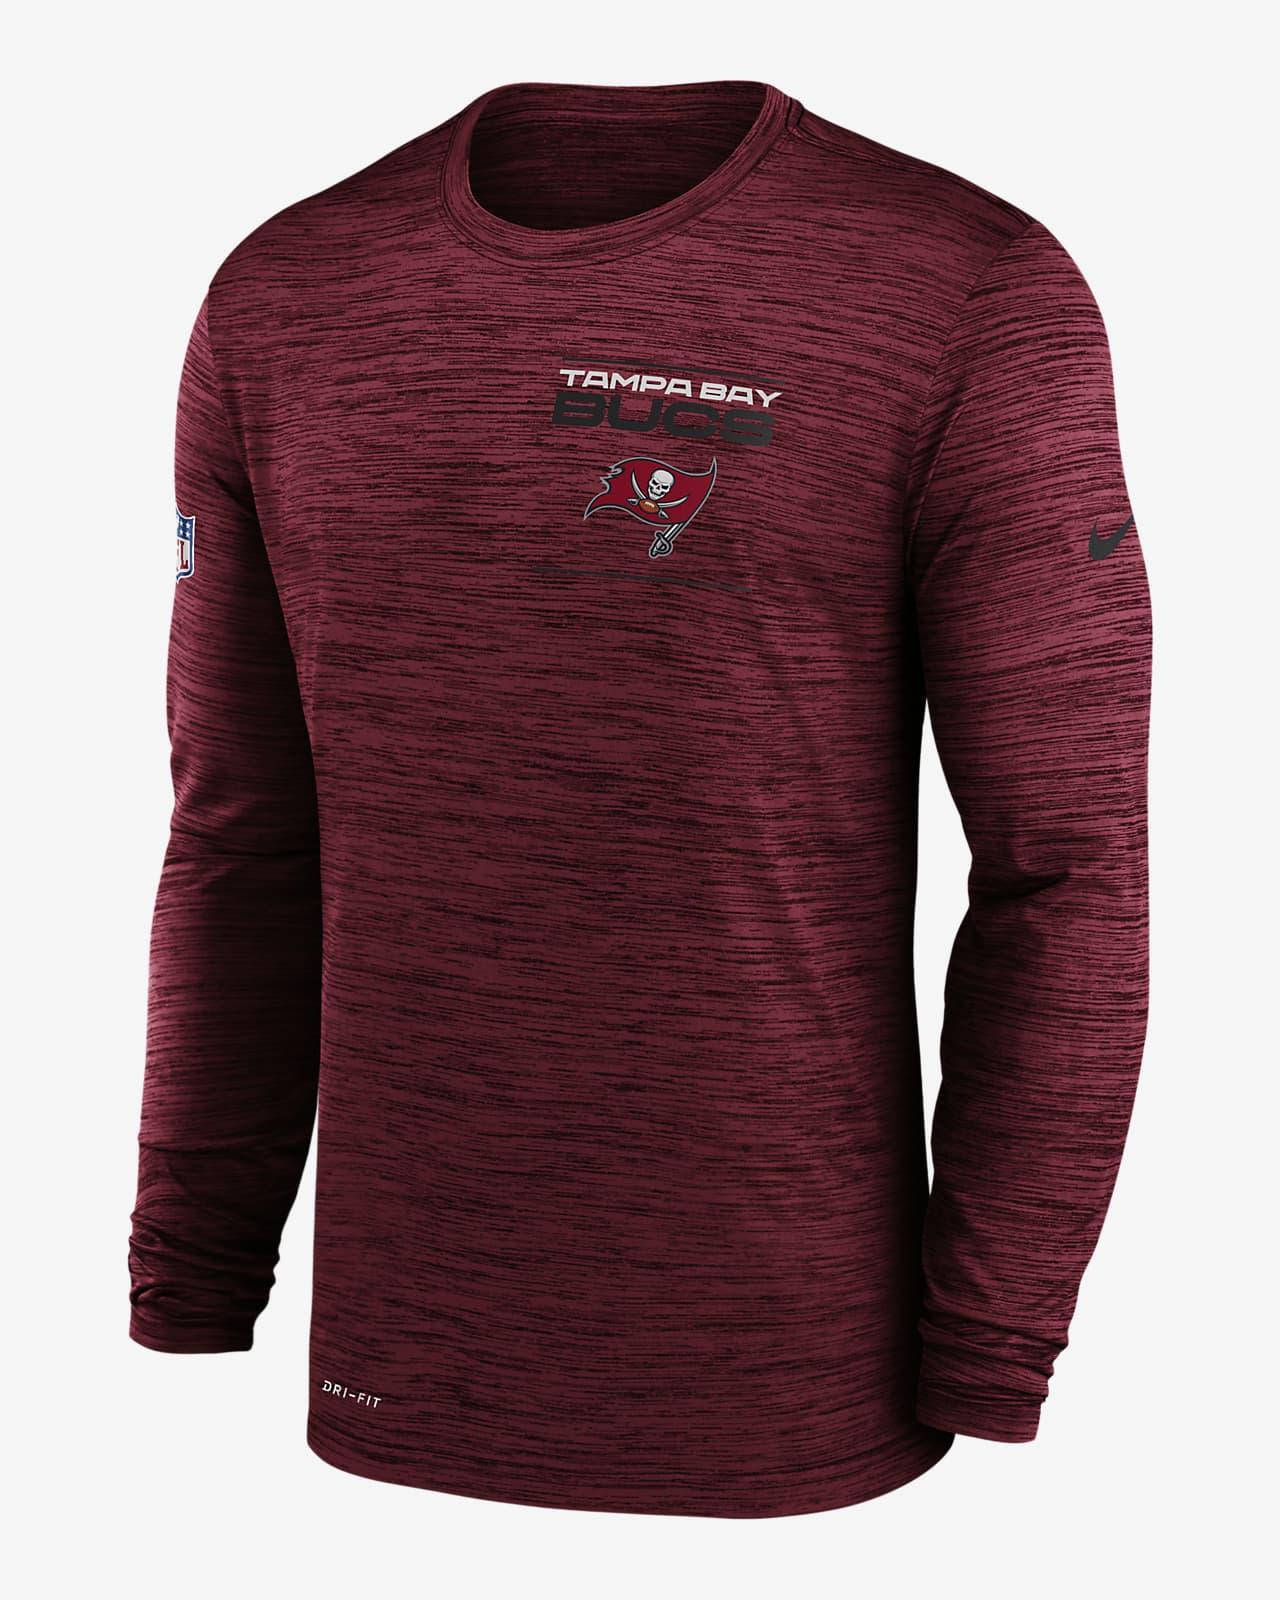 Nike Dri-FIT Sideline Velocity Legend (NFL Tampa Bay Buccaneers) Men's Long-Sleeve T-Shirt